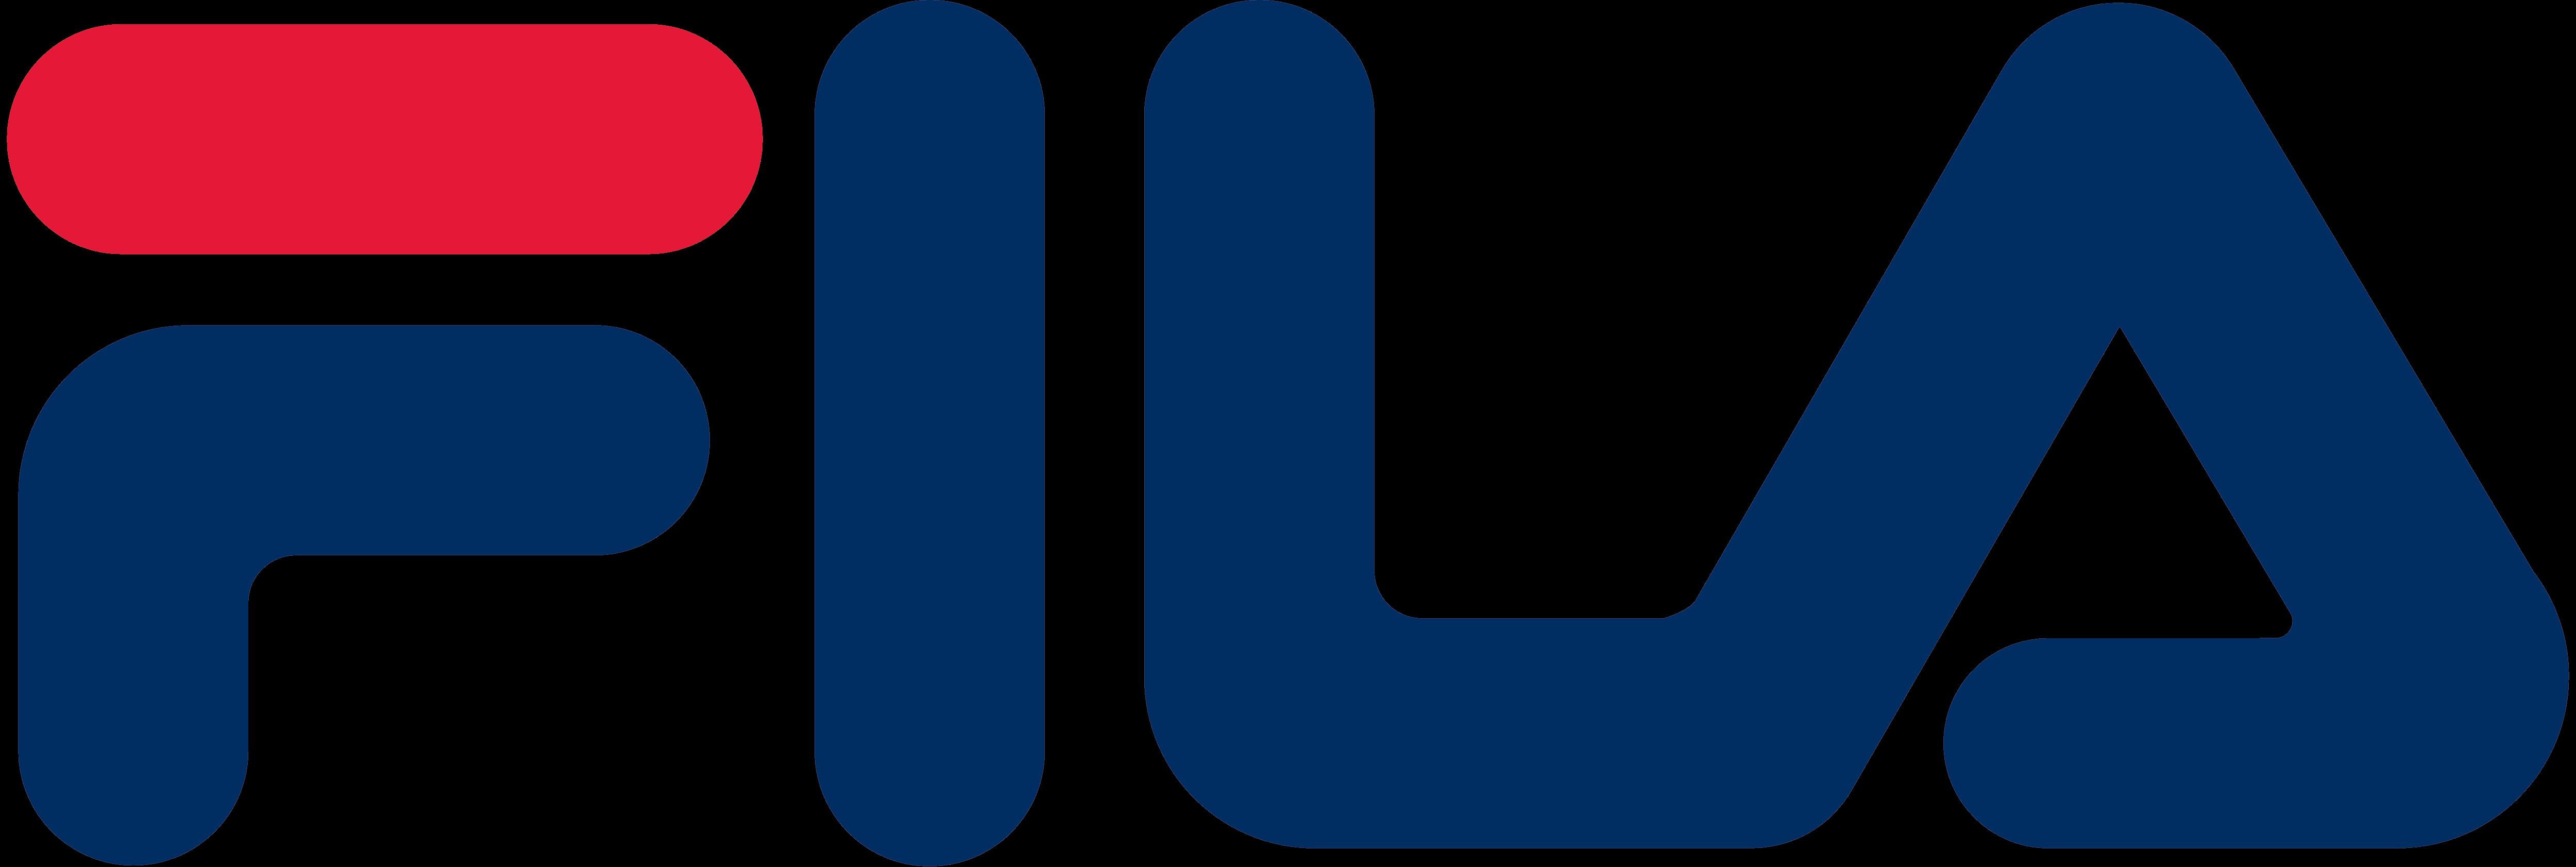 Footwear logo creator